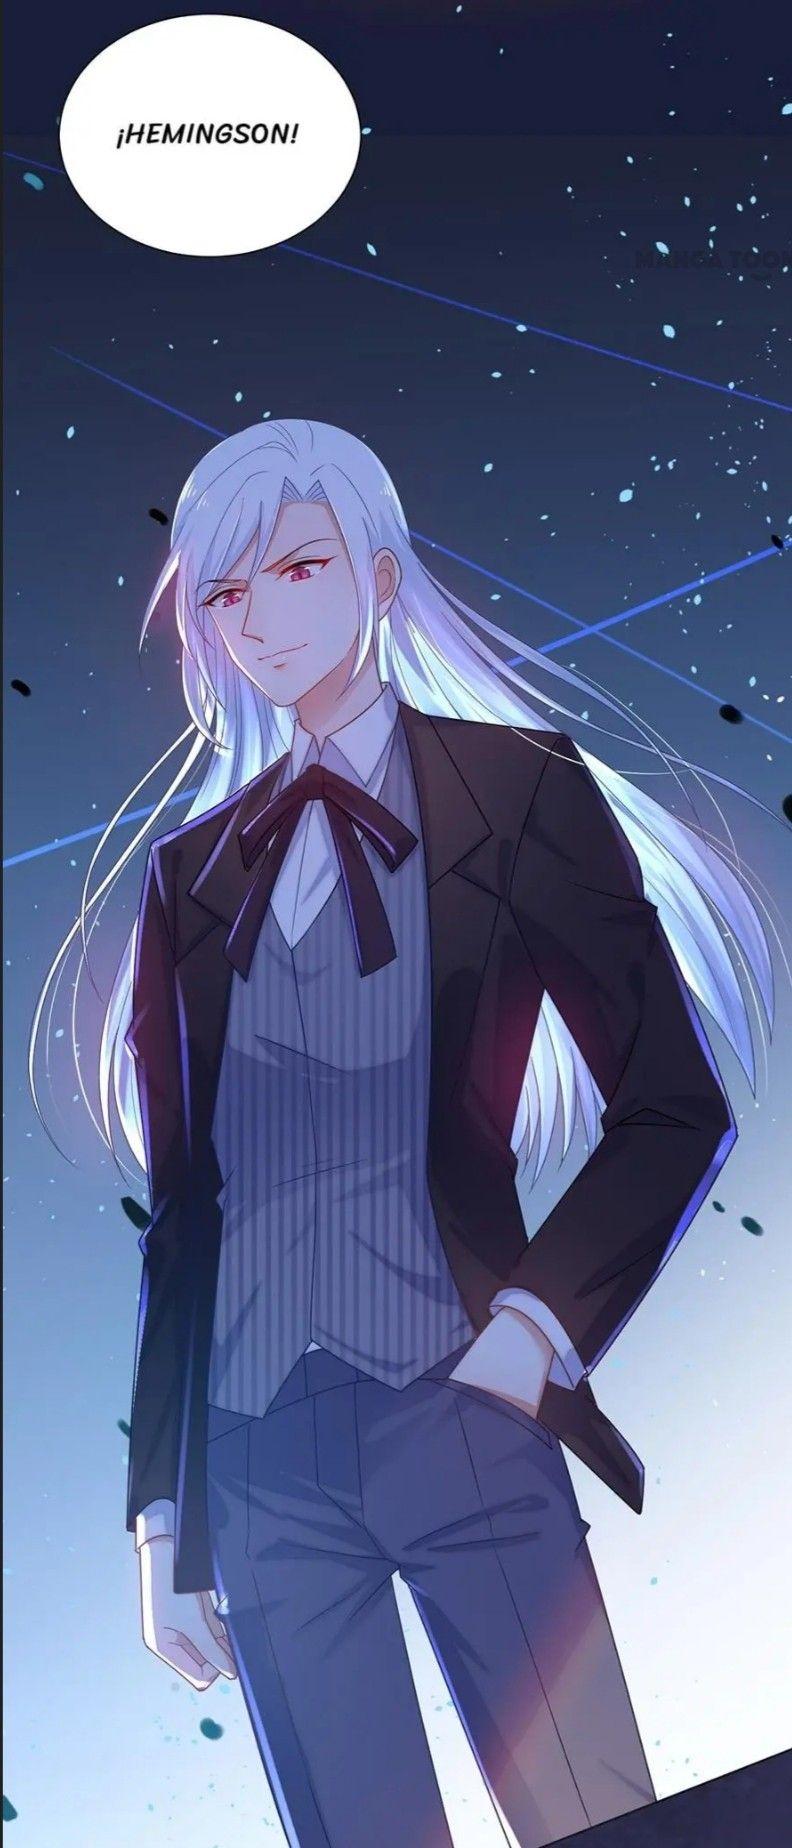 Hemingson In 2020 Anime Manga Boy Character